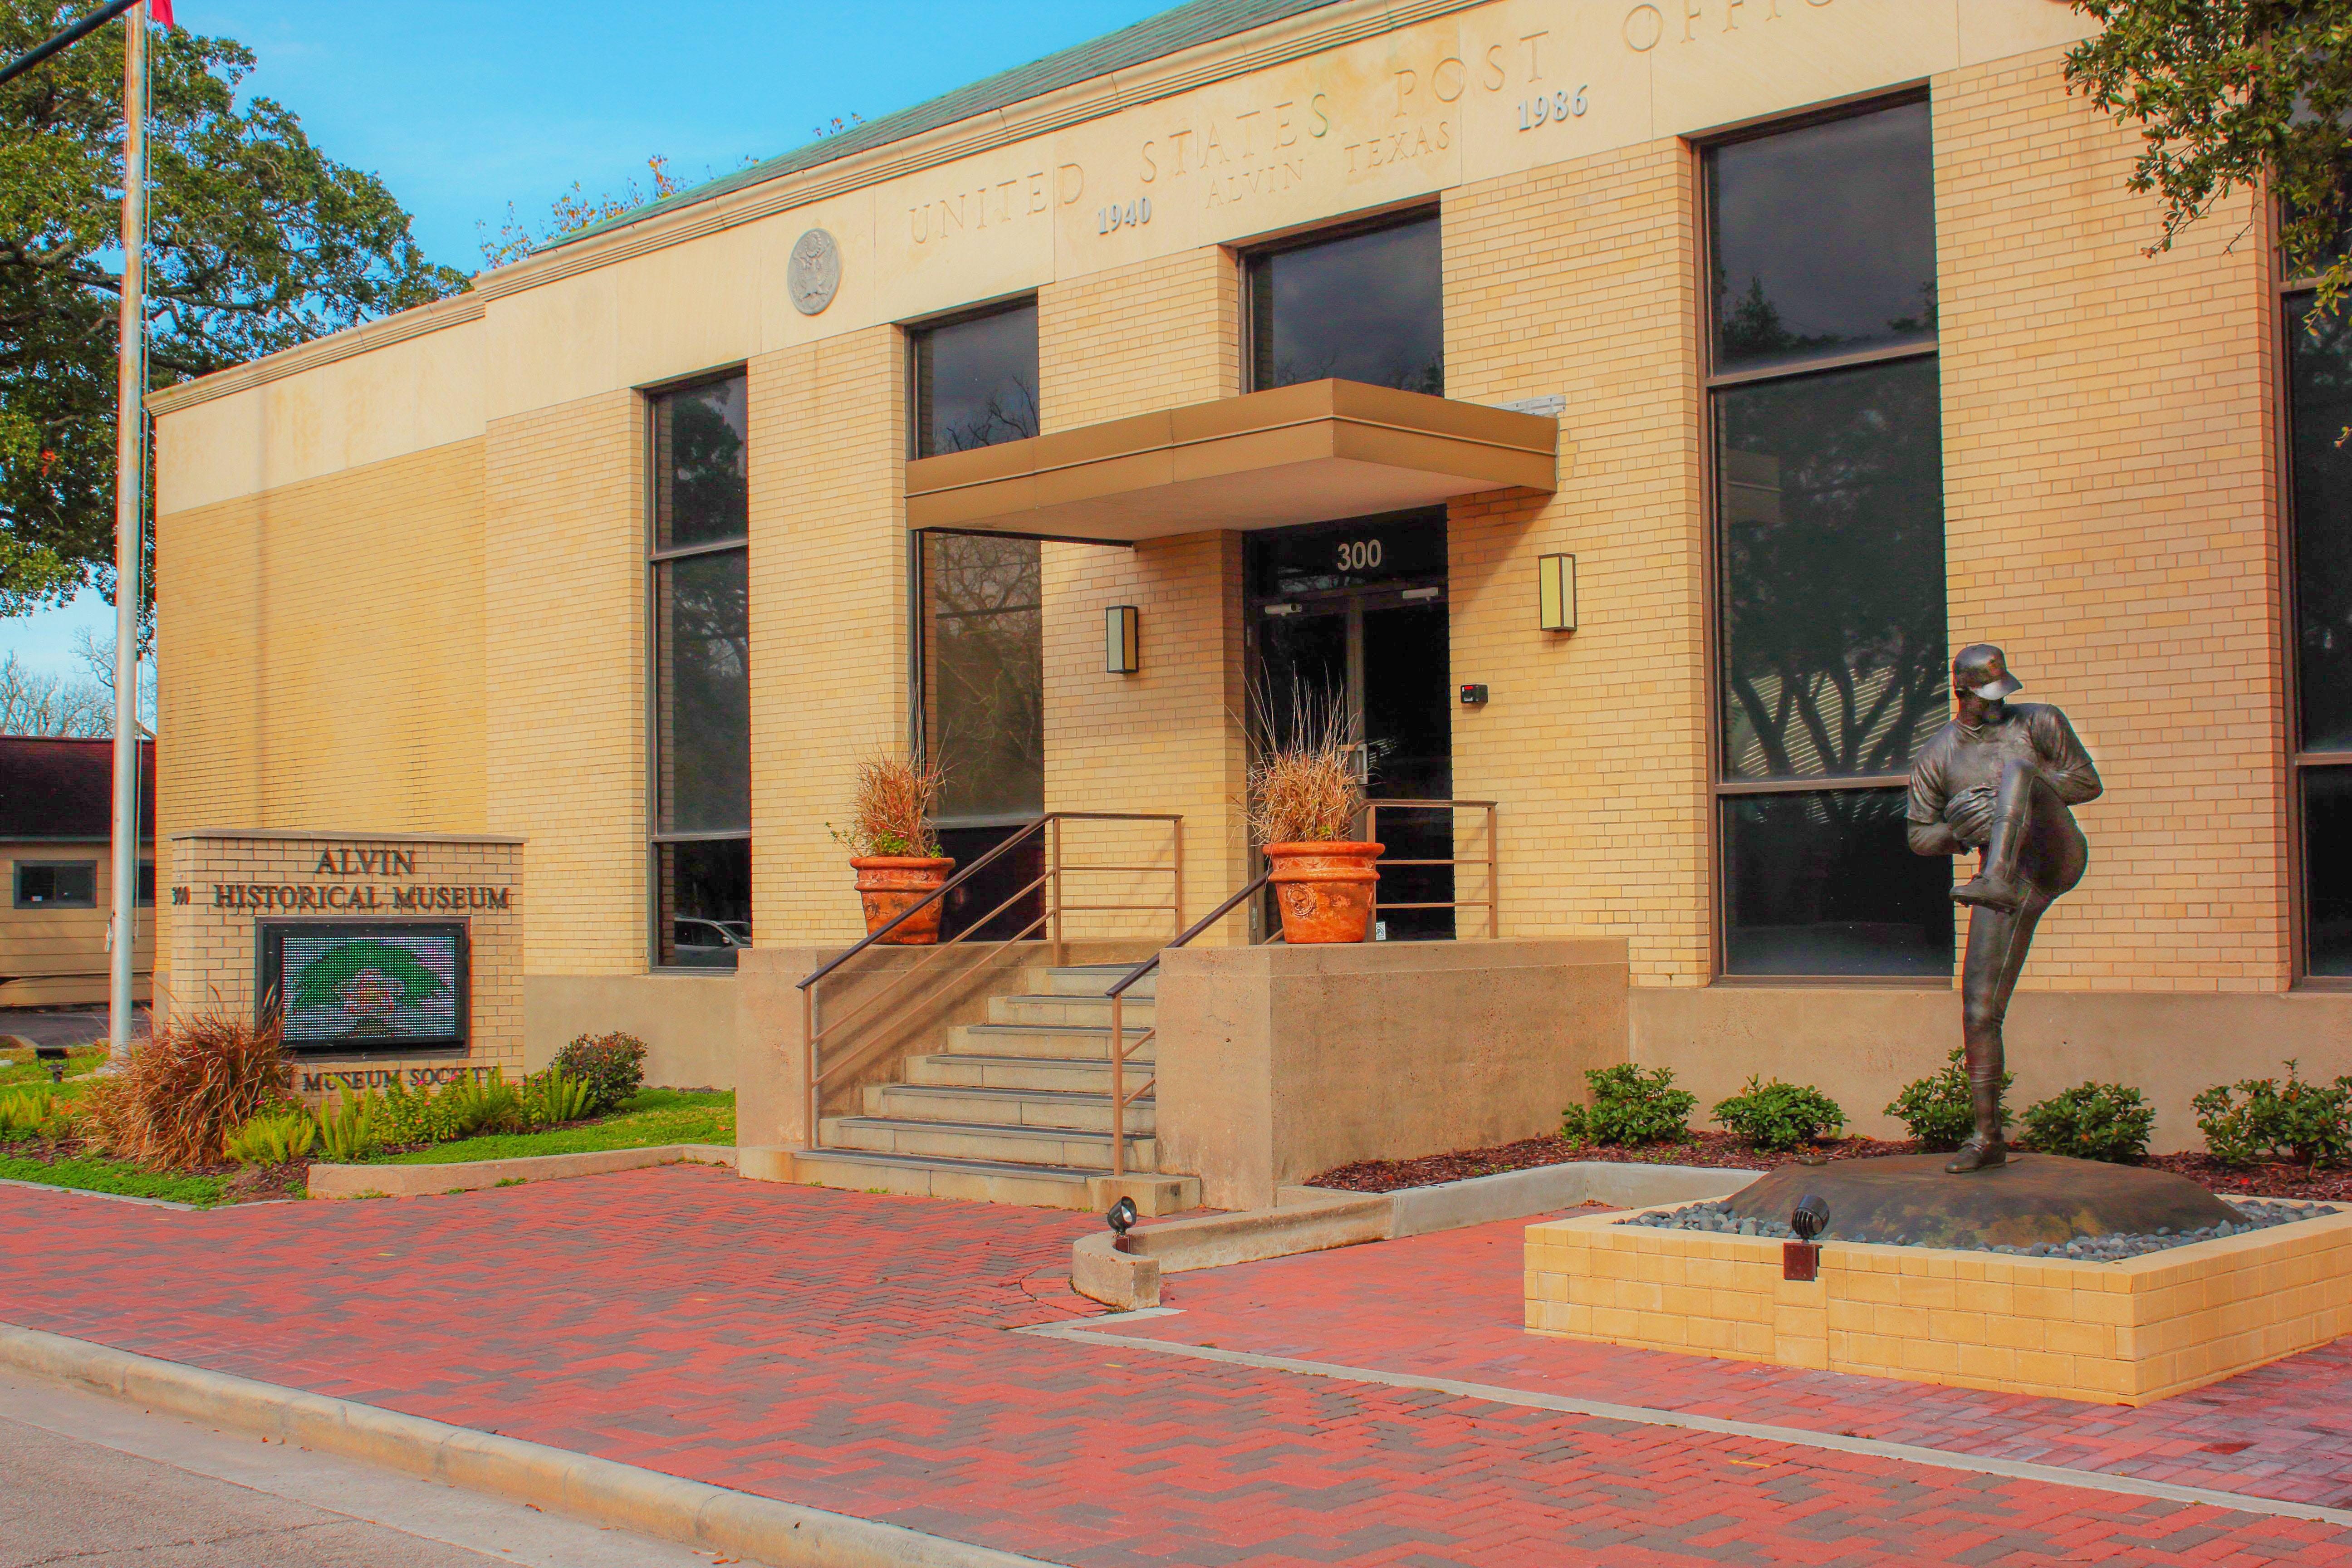 Alvin Museum Society